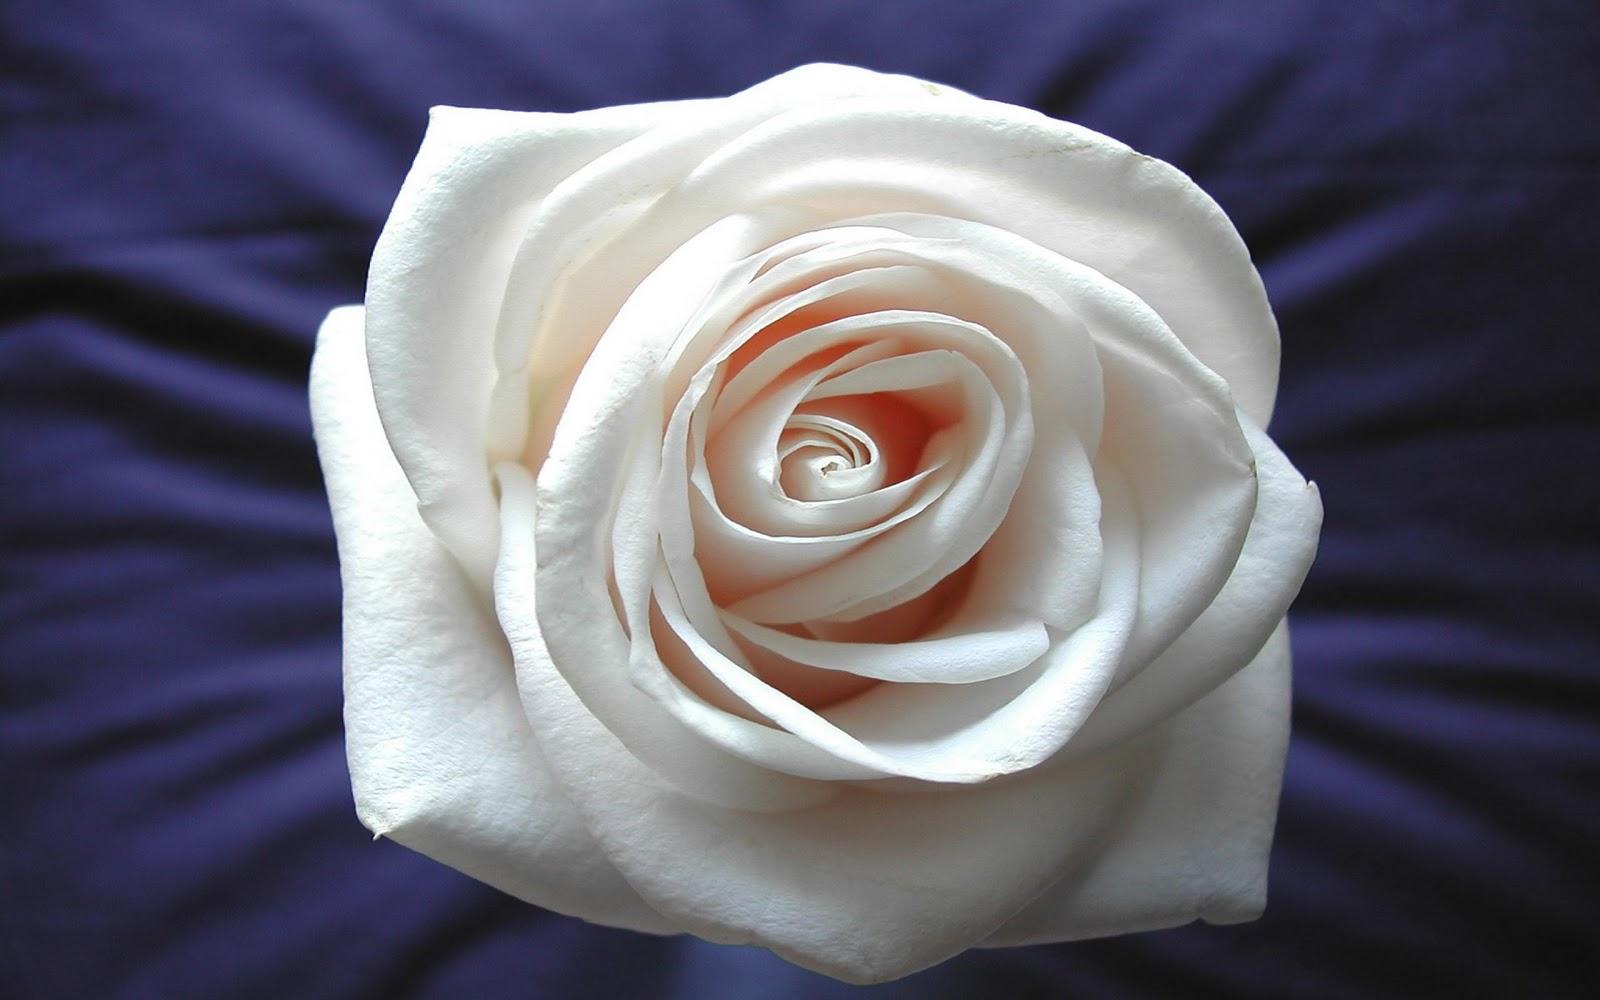 rozen desktop achtergronden